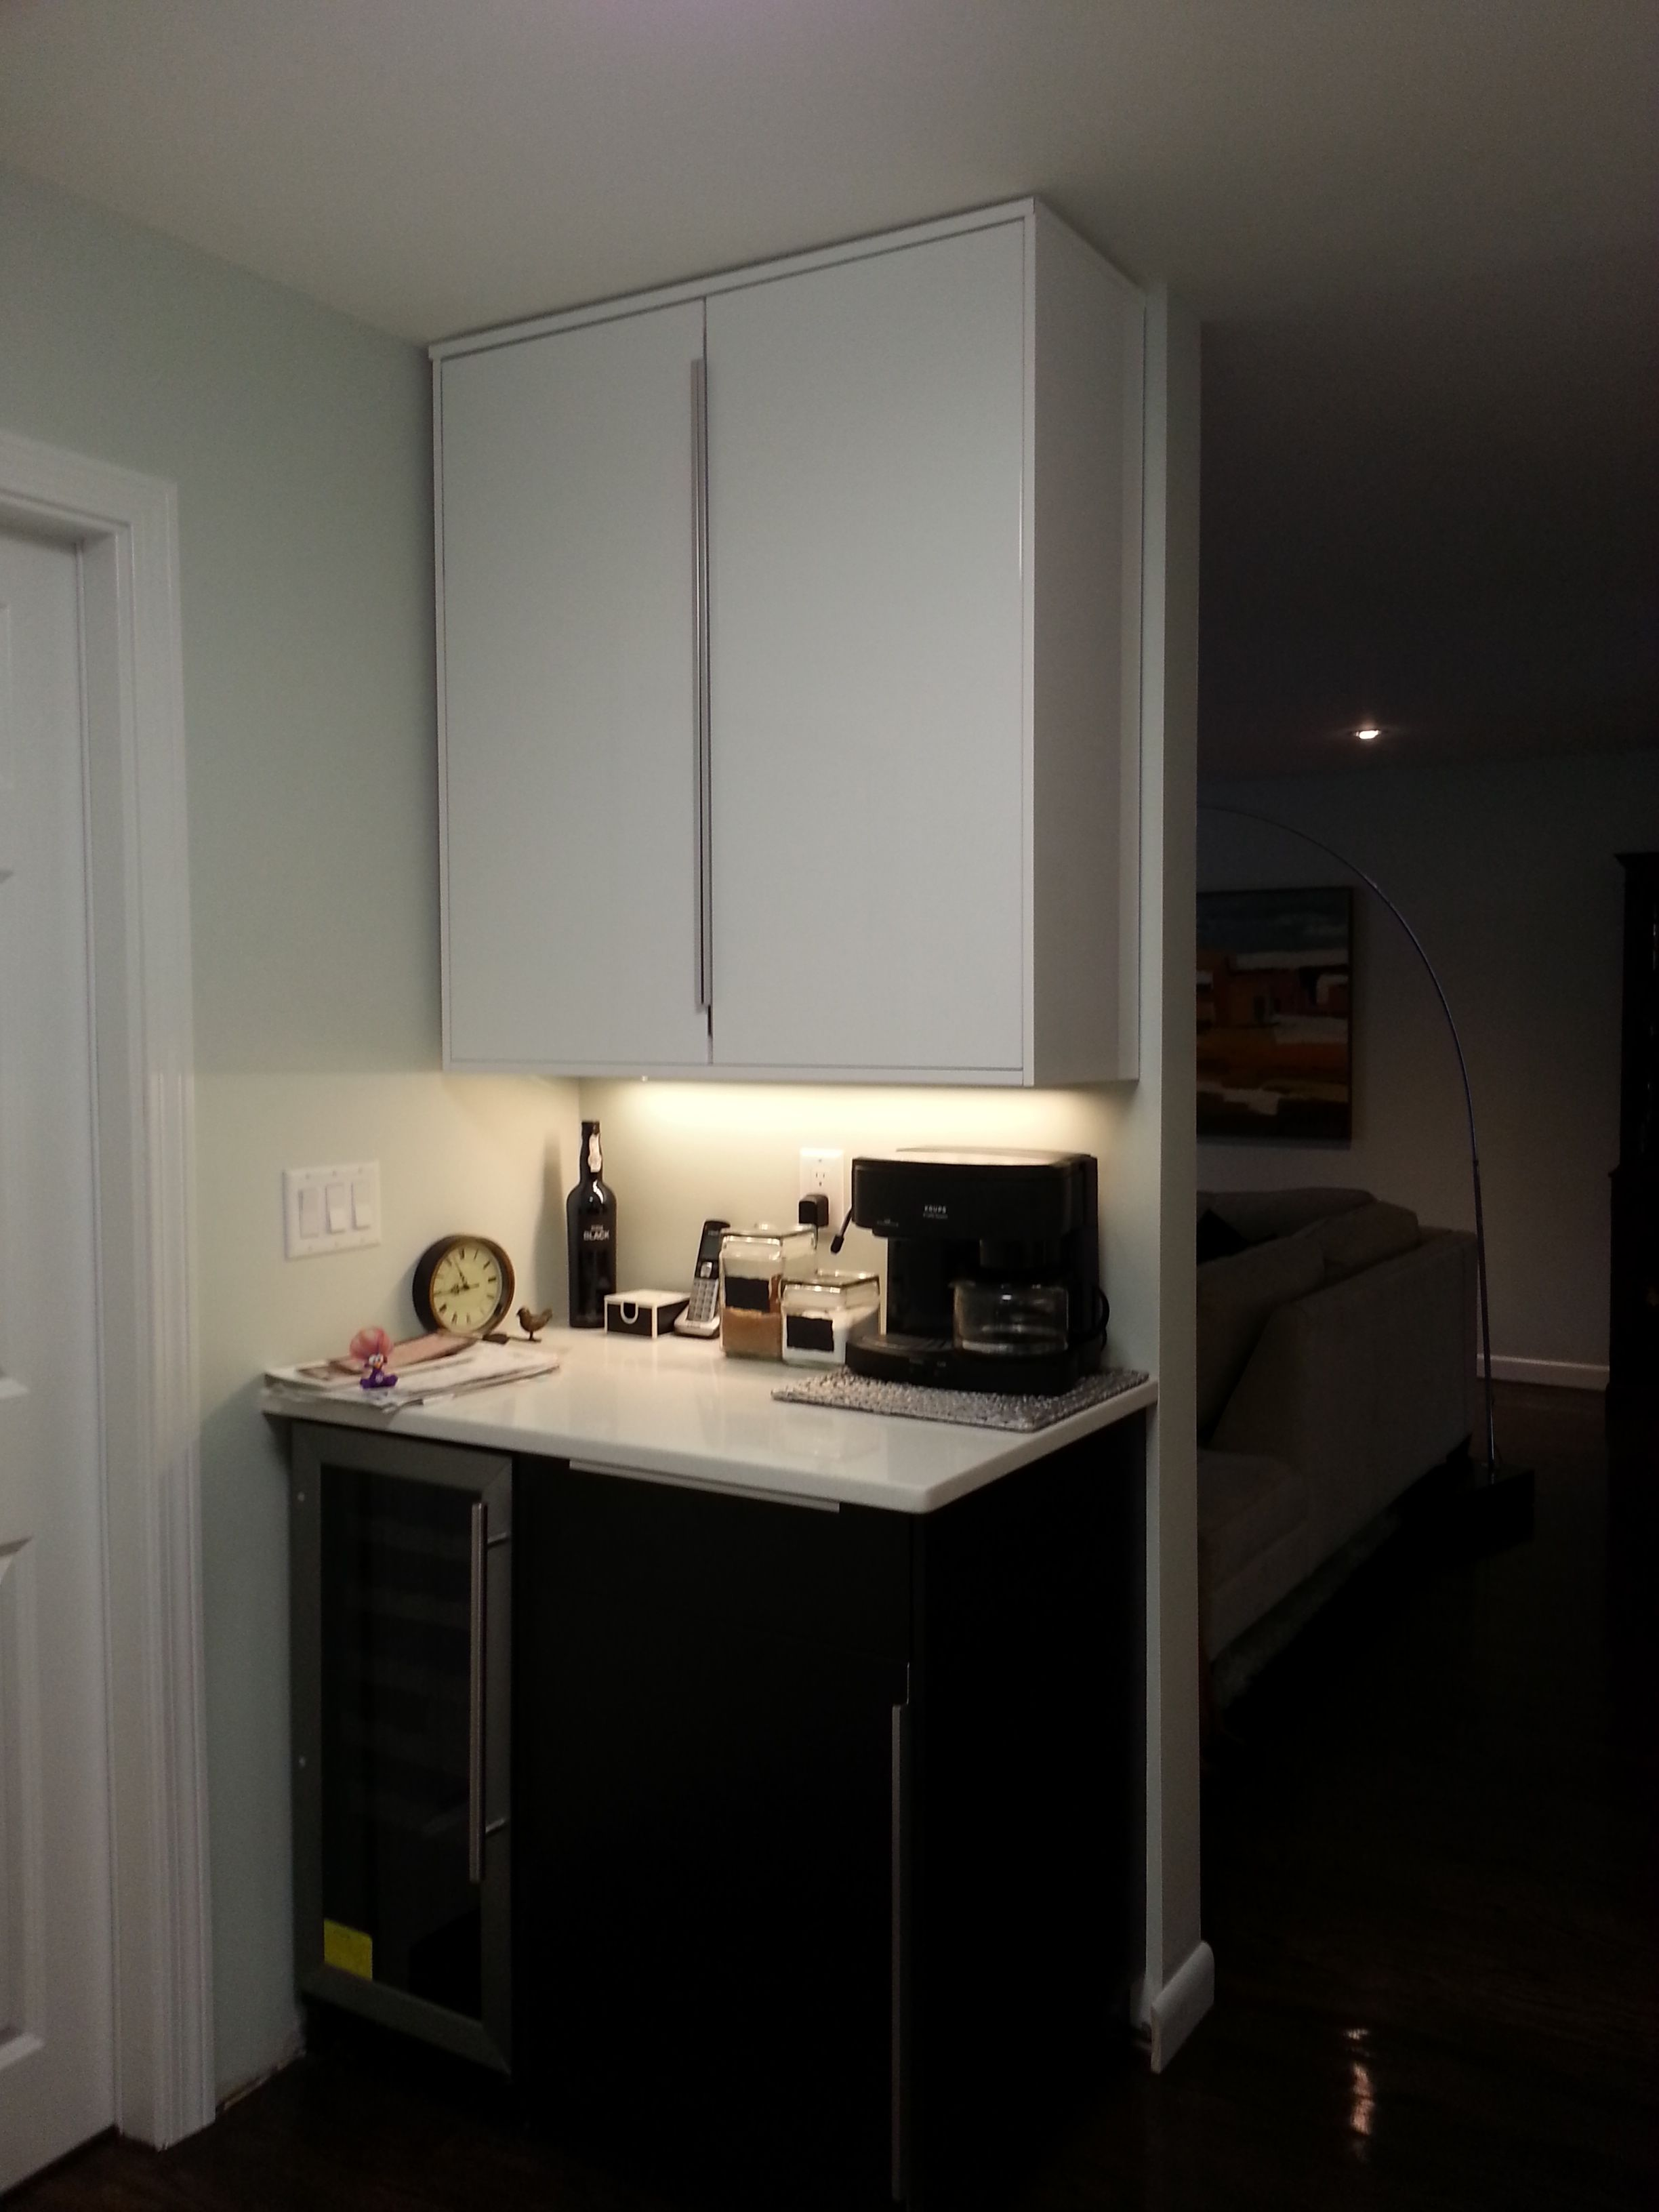 Ringhult white with blankett handles Ikea kitchen design